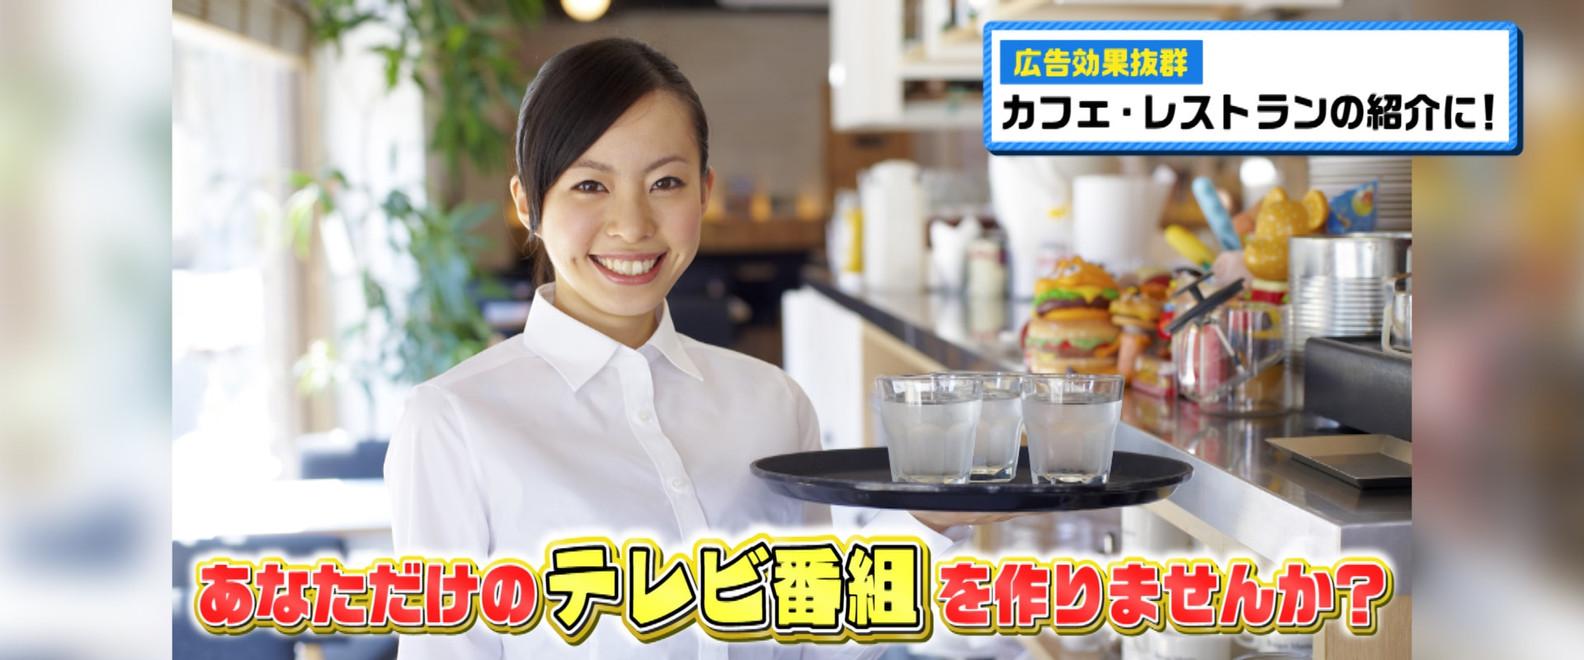 Luvas_サービス_TV (3).jpg